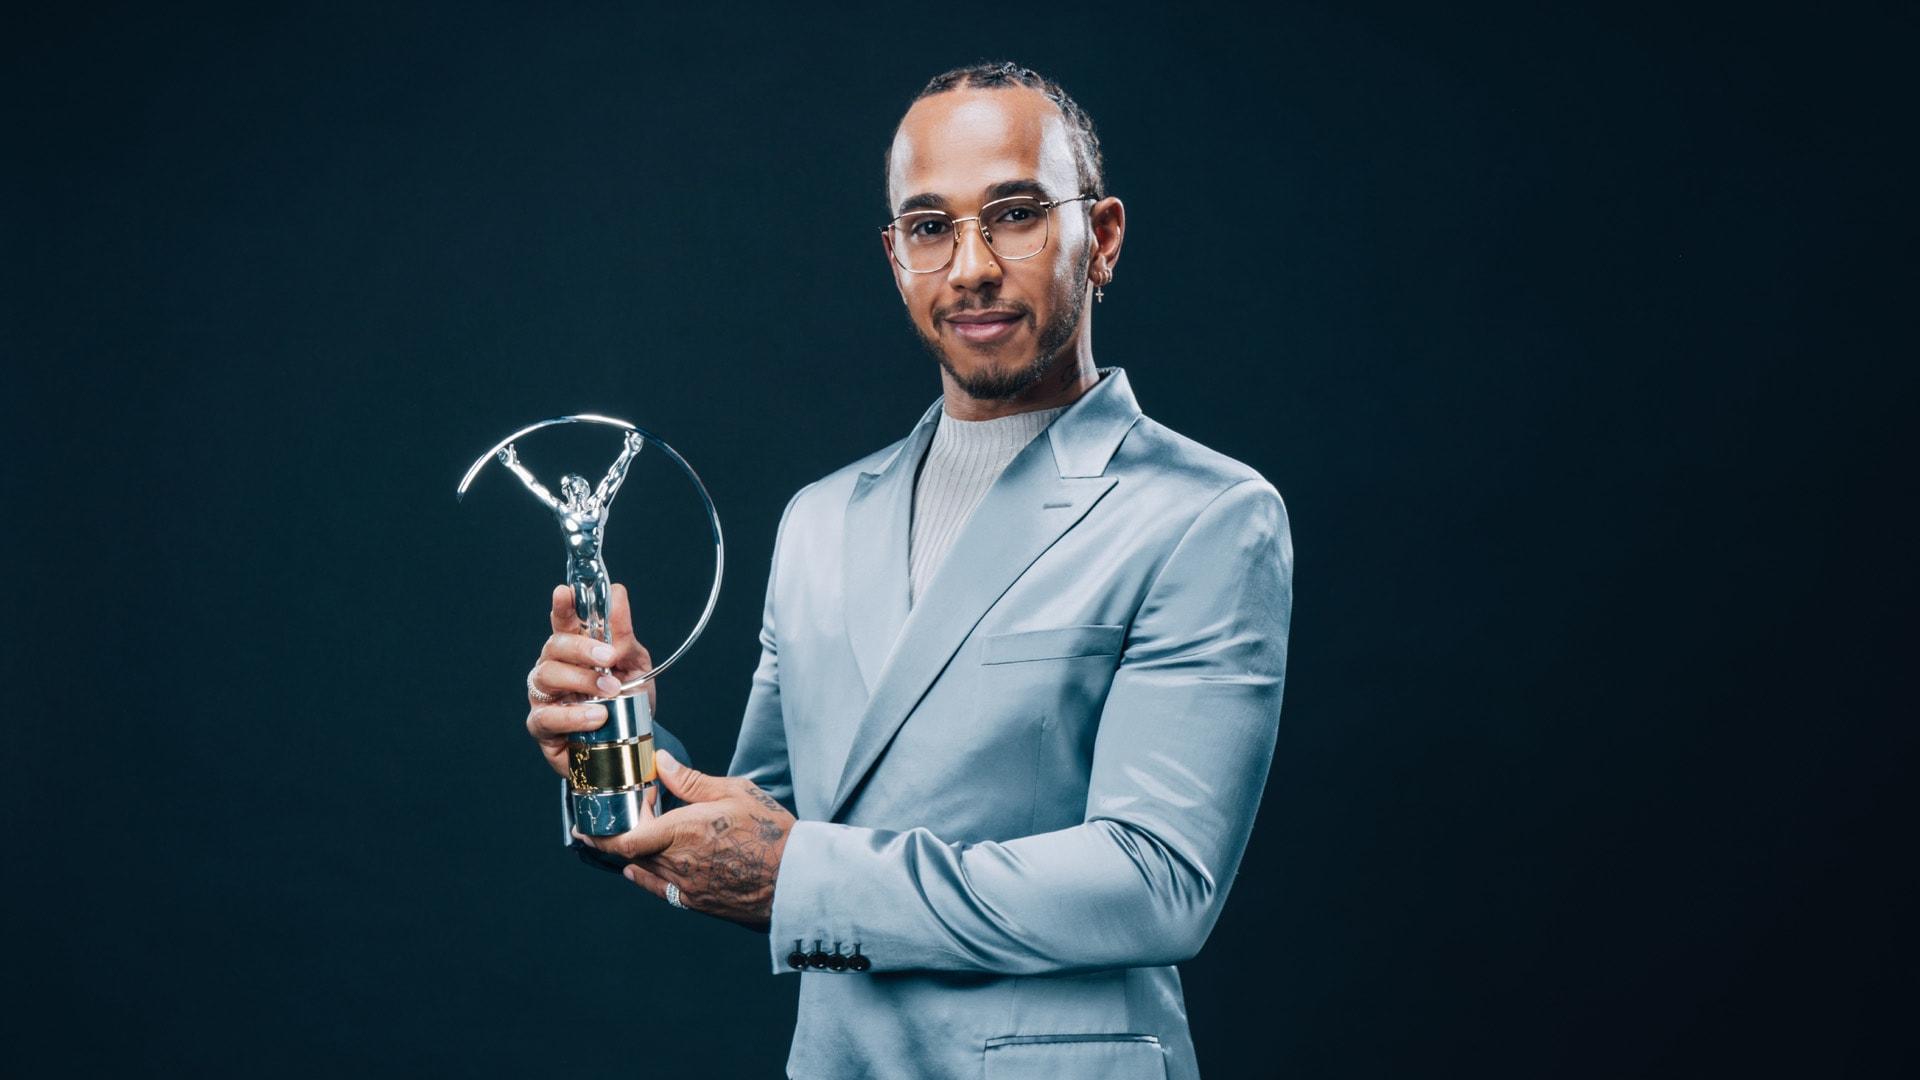 Lewis Hamilton, co-winner of the Laureus World Sportsman of the Year Award, February 17, 2020